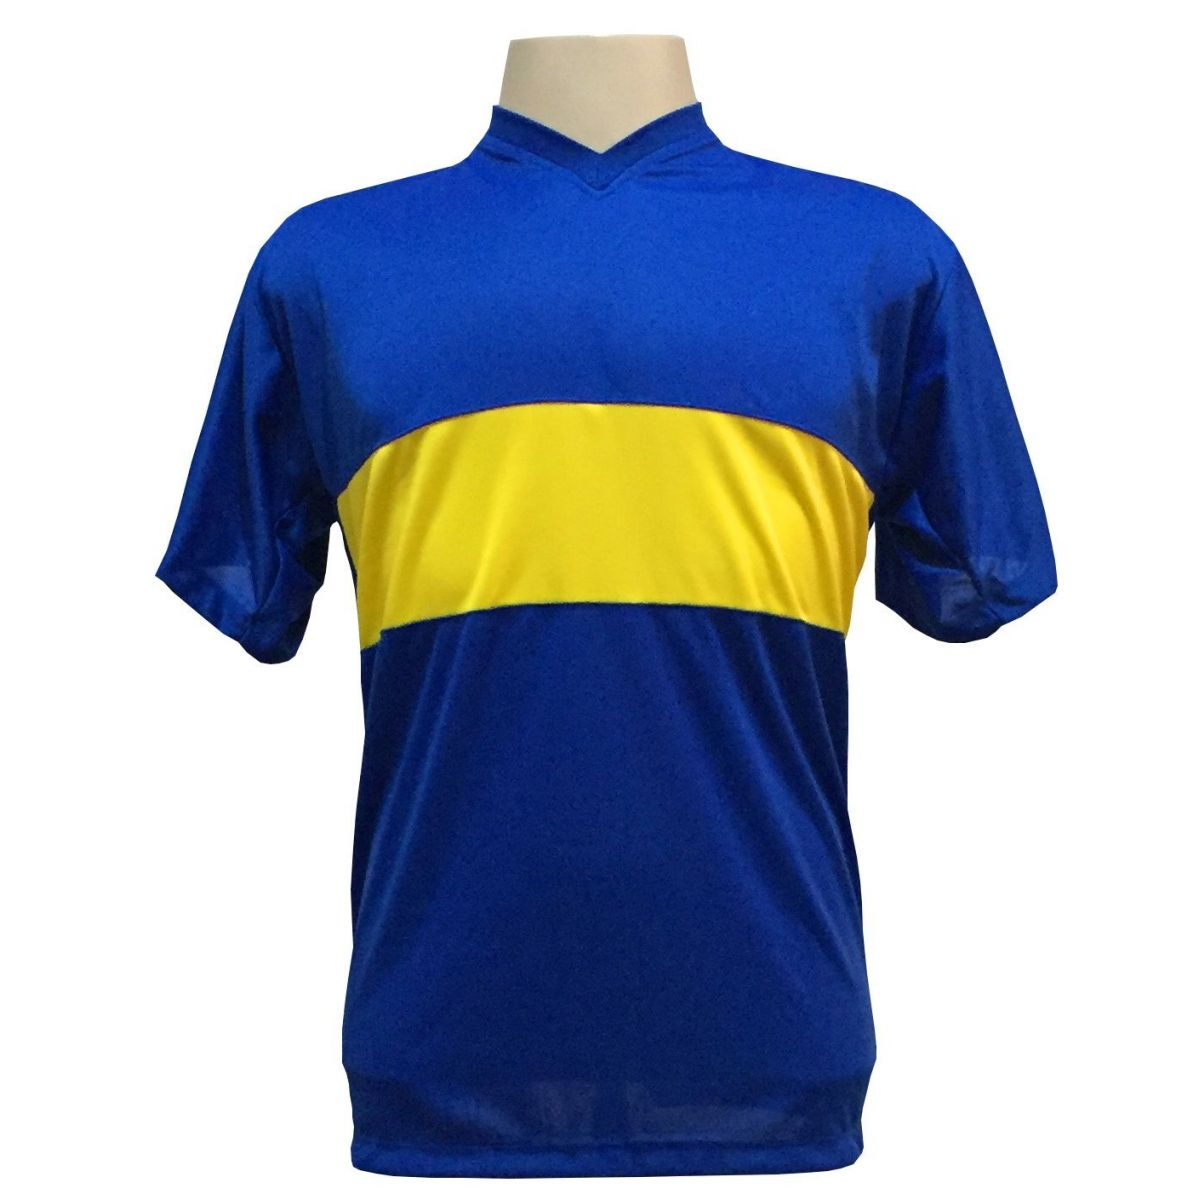 5a8703b469 Camisa Boca Juniors